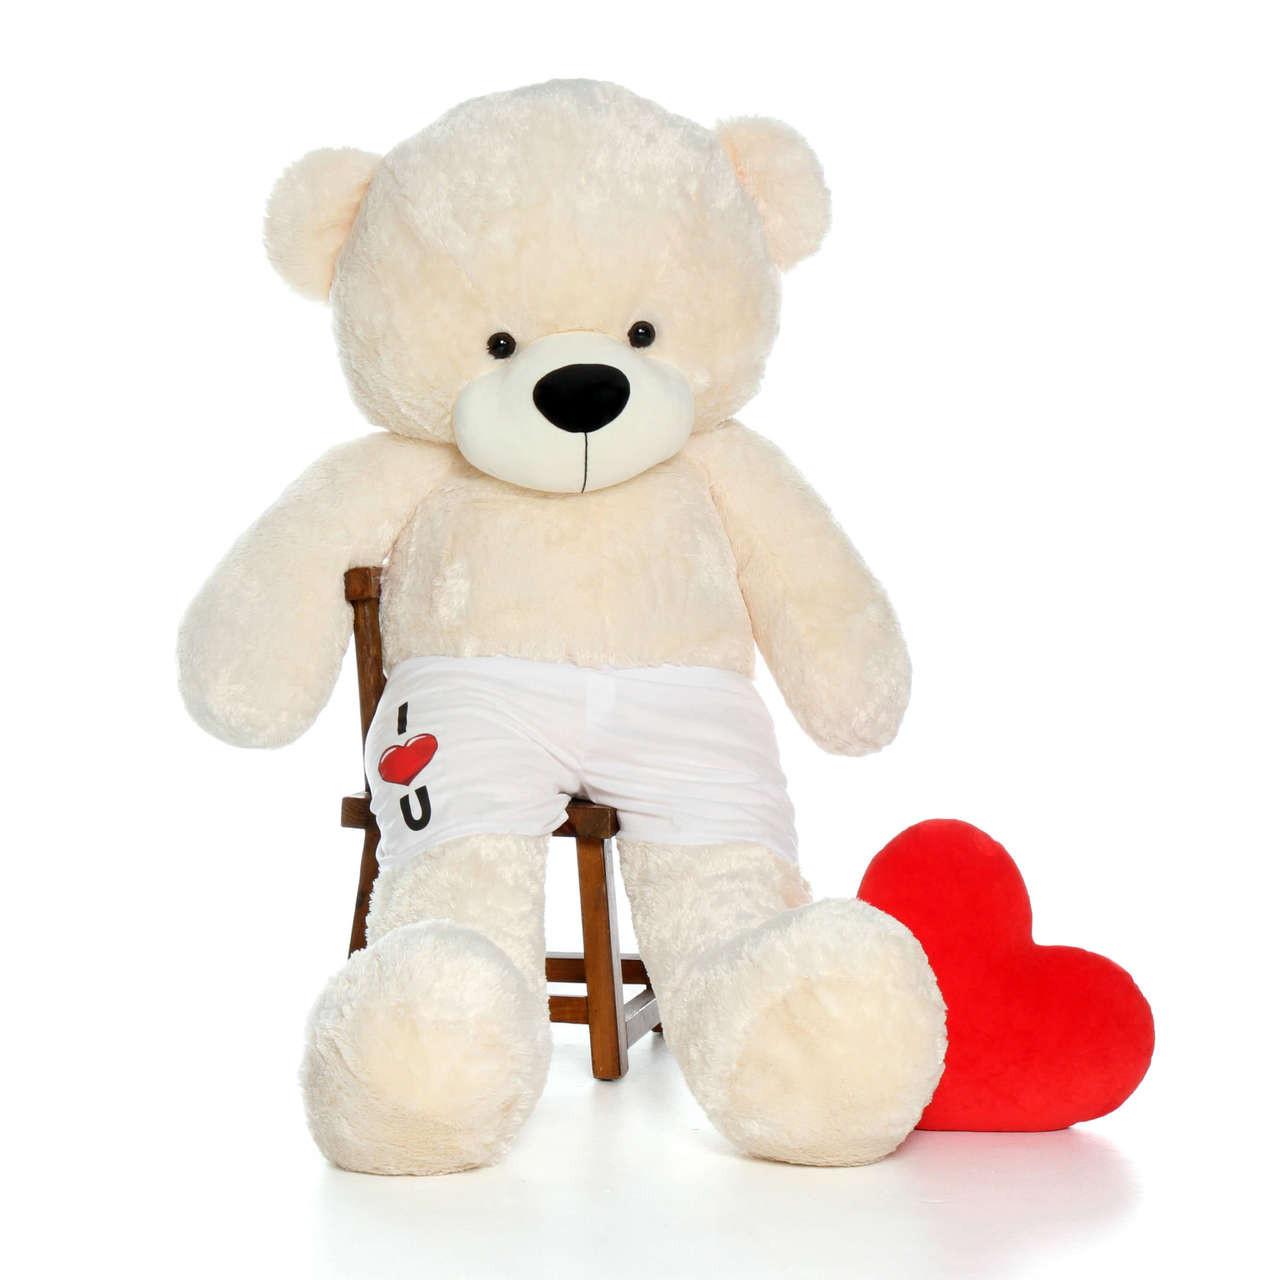 6 Foot Cream Giant Teddy Bear with custom I Love You Boxers